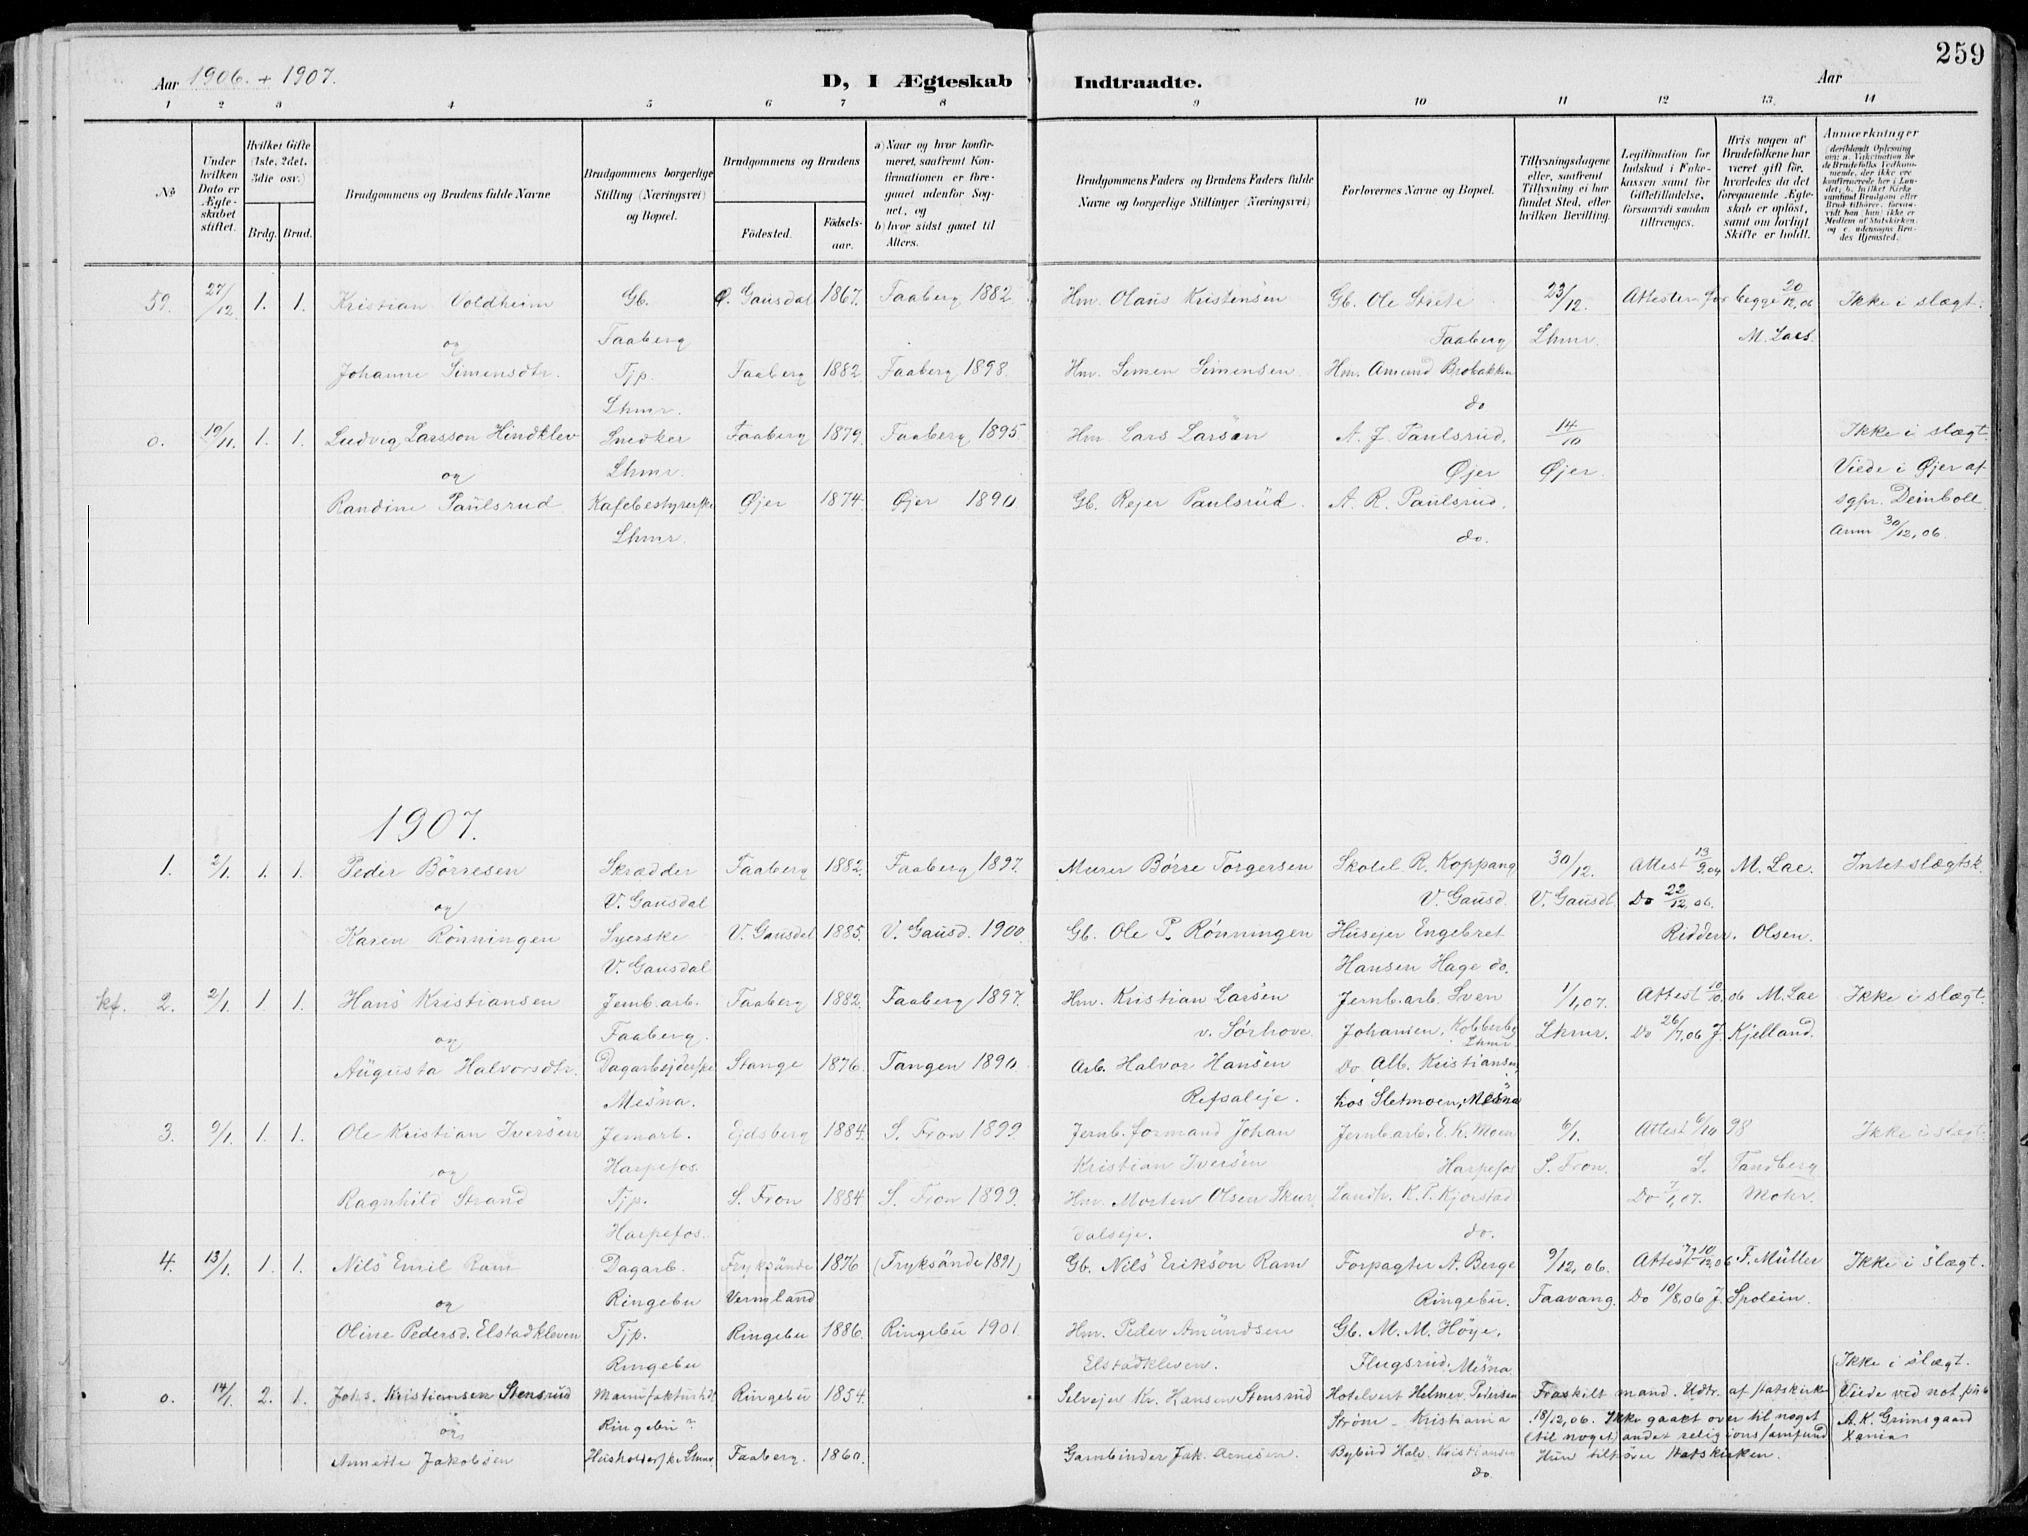 SAH, Lillehammer prestekontor, Ministerialbok nr. 1, 1901-1916, s. 259